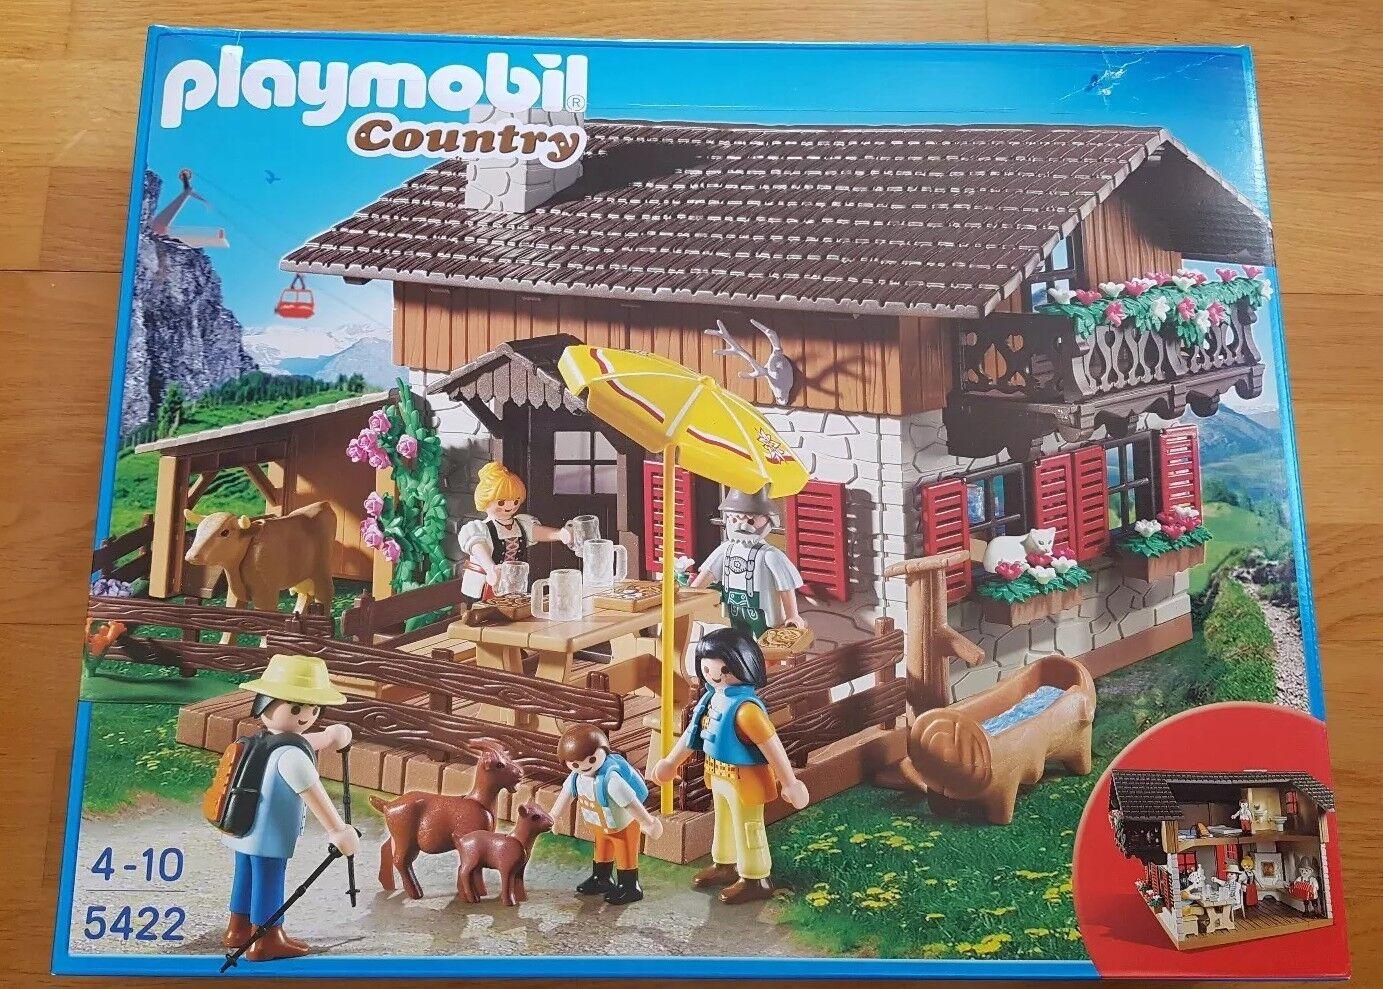 Playmobil Almhütte Country 5422 Alter 4-10 Jahre NEU